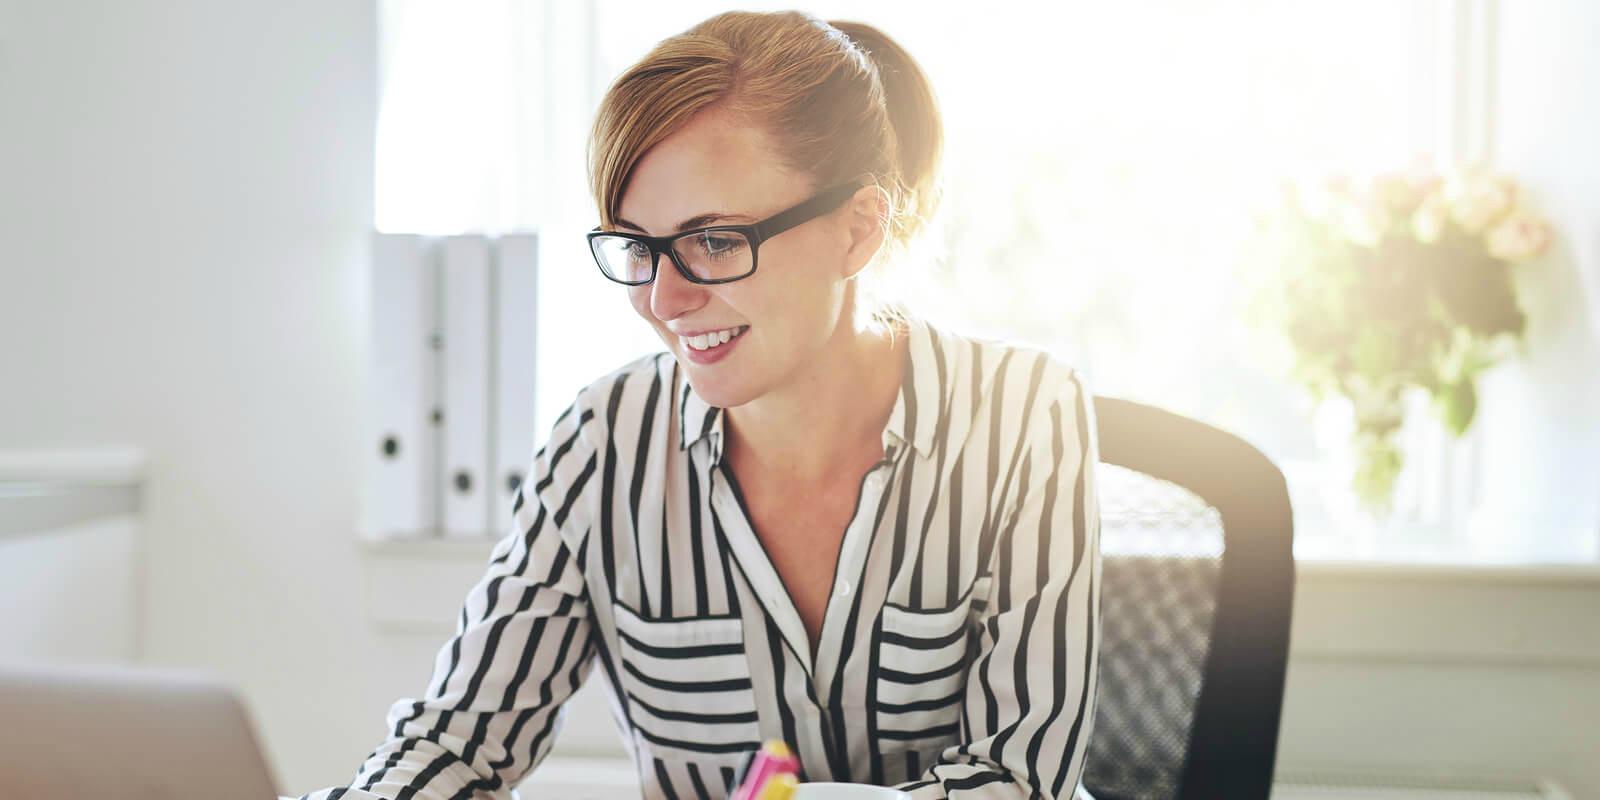 Employee seeking work flexibility